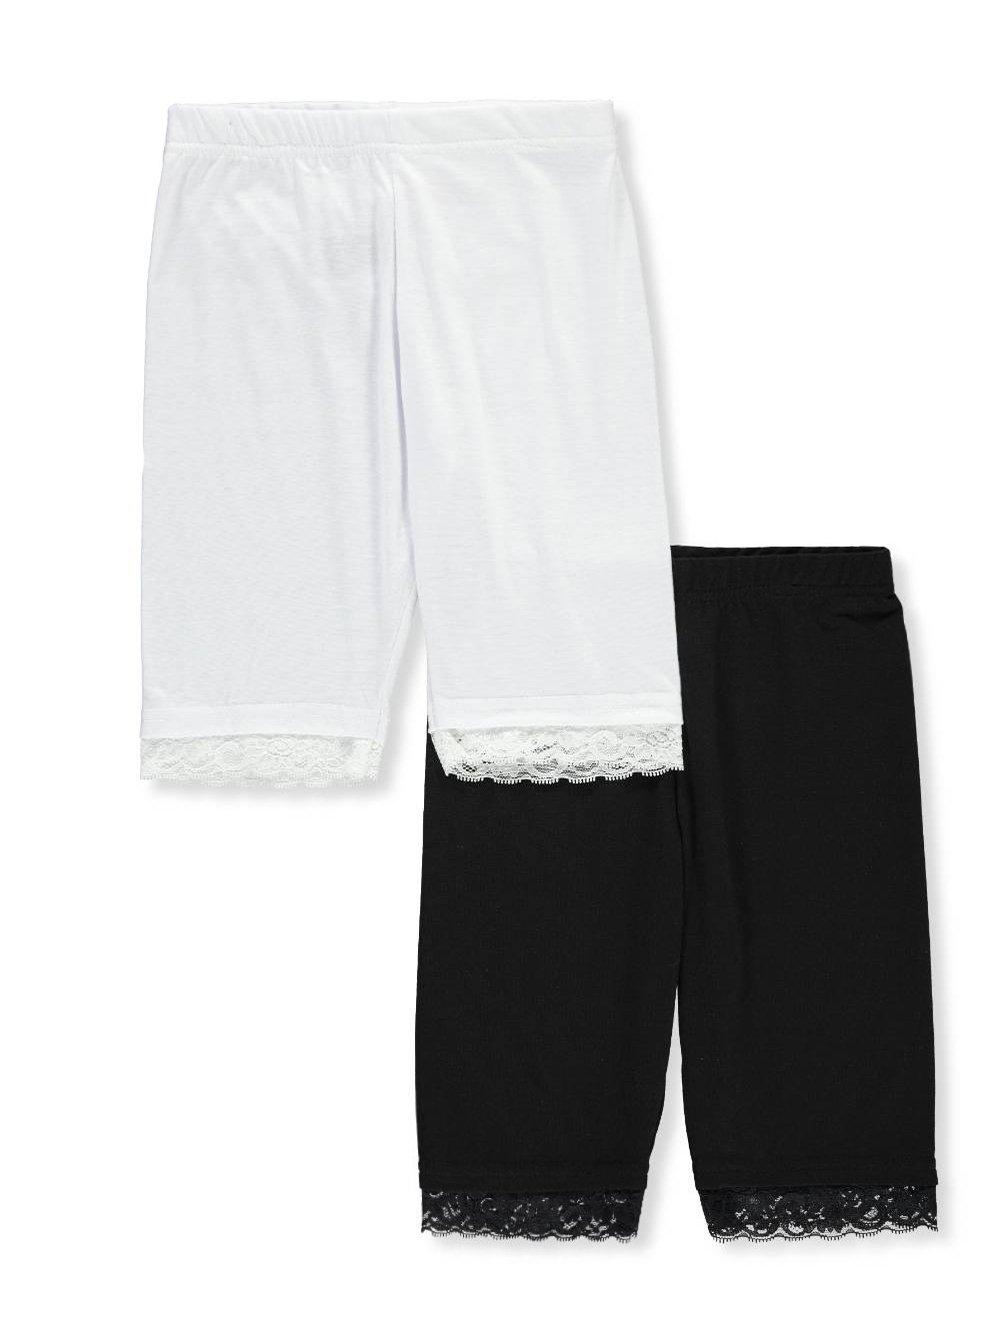 93dfeed5b567 Get Quotations · Dream Star Girls  2-Pack Bike Shorts